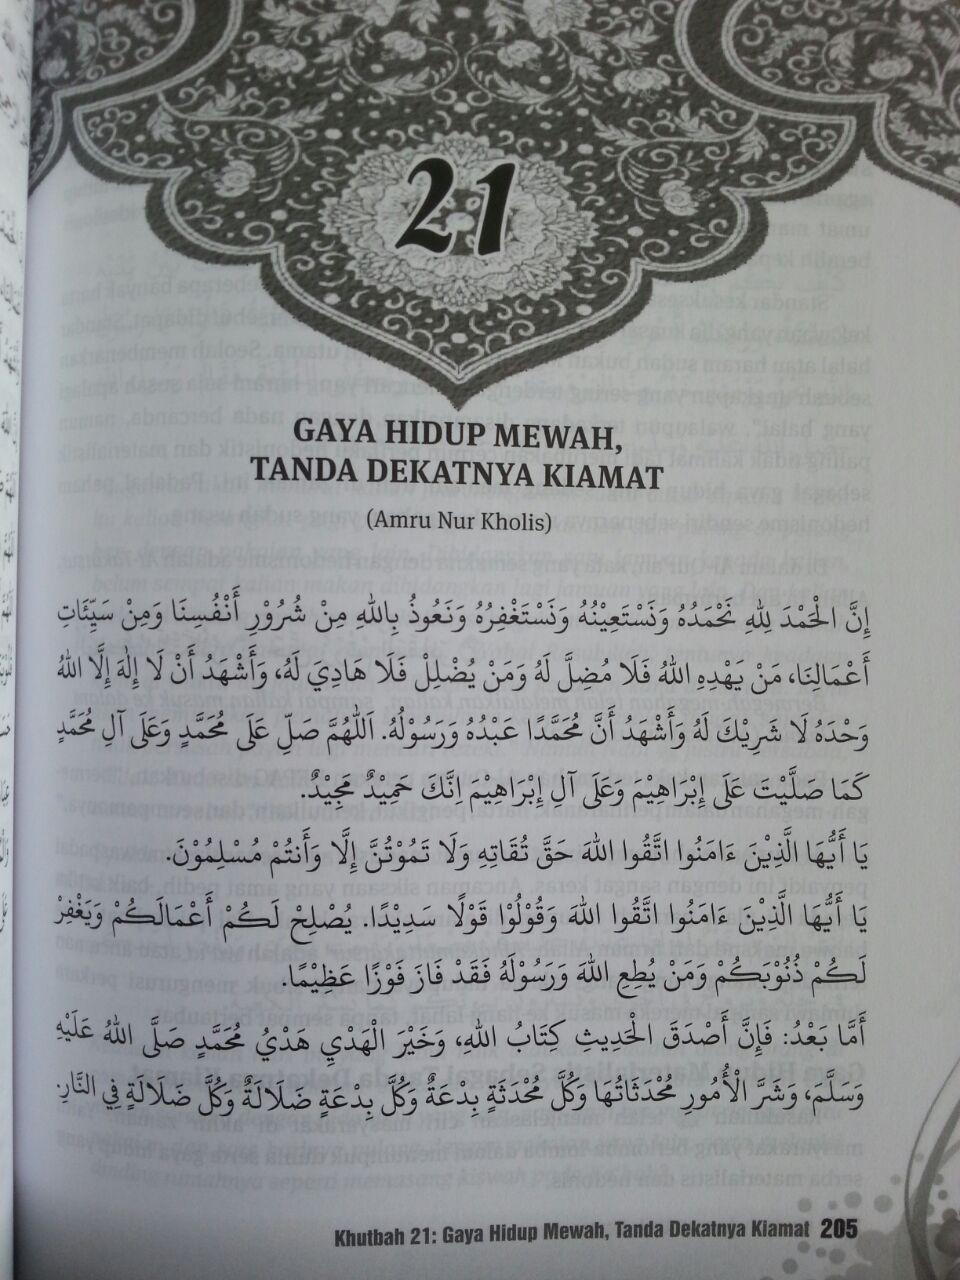 Buku Khutbah Jum'at Akhir Zaman 52 Pesan Wasiat Nasihat Menggugah isi 3